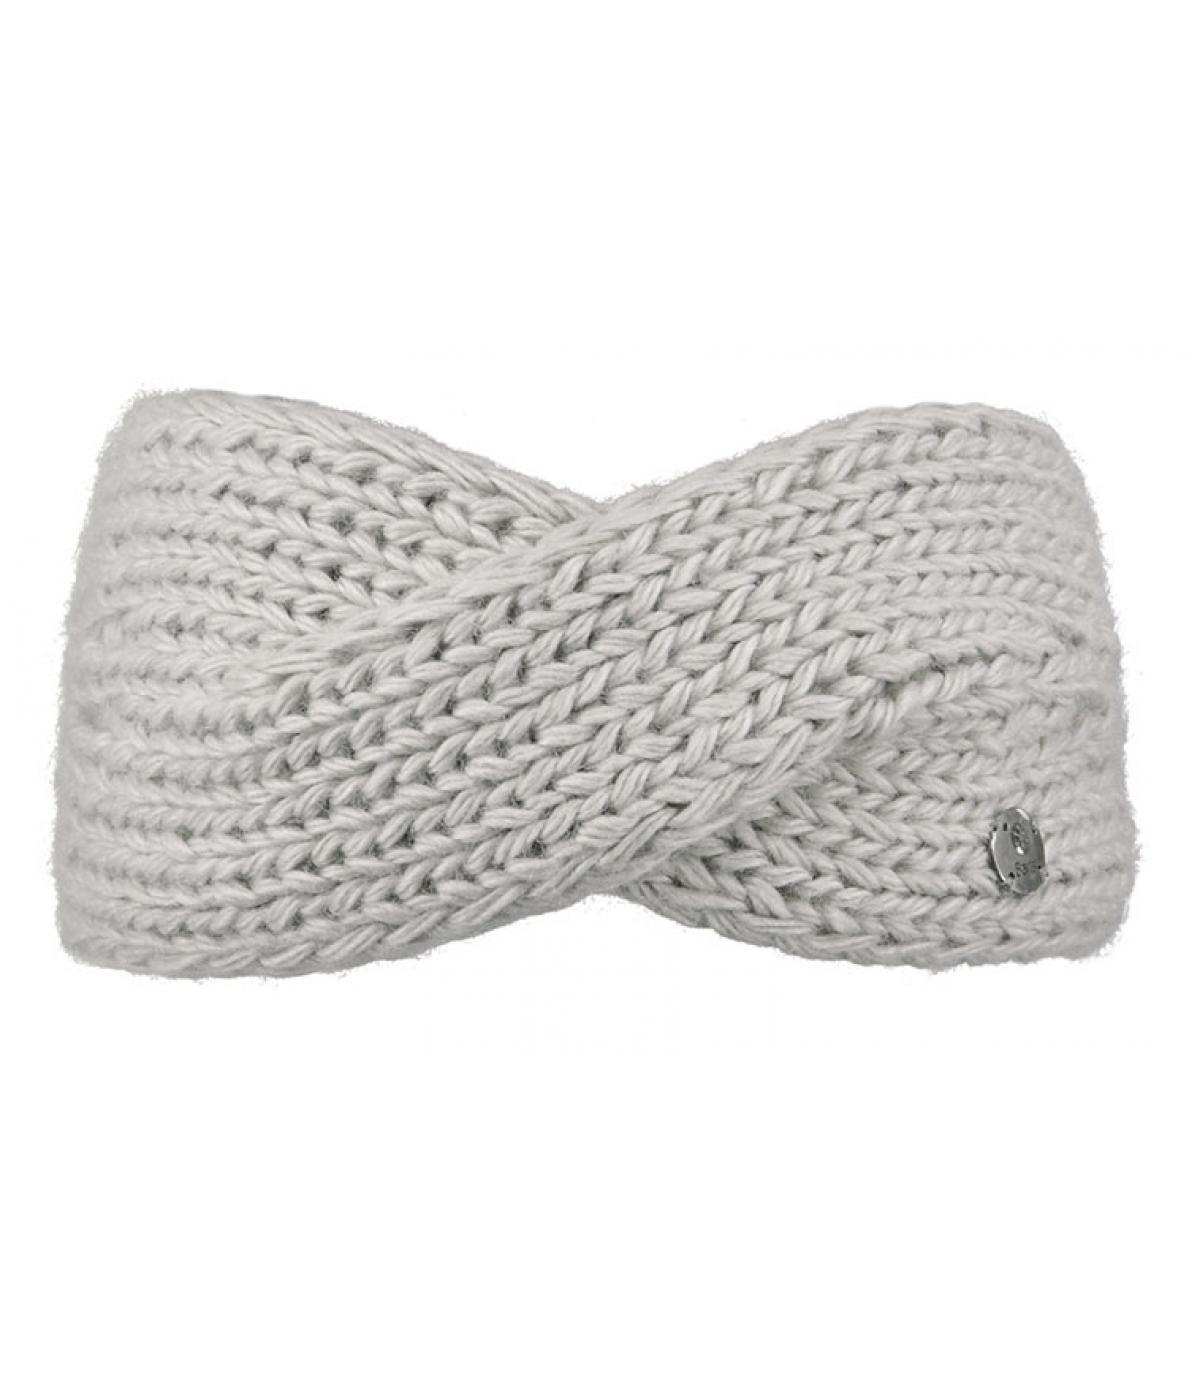 Détails Yogi Headband oyster - image 2